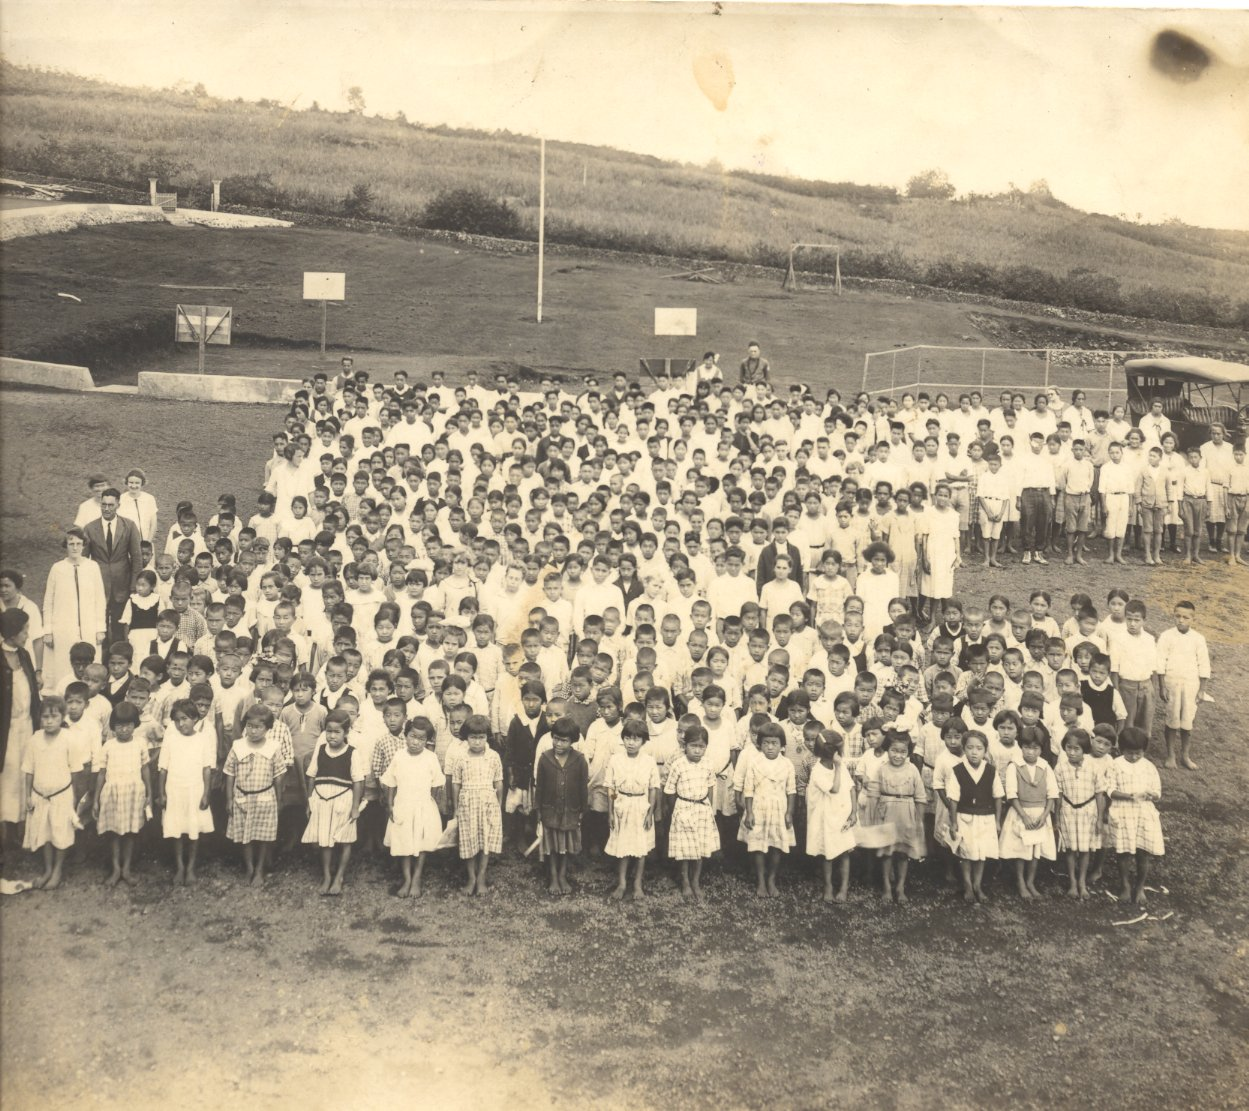 School children with teachers on play field c. 1930's. Photo donated by Paul F. Hirokawa, KonawaenaHigh School graduate, Class of 1944. From the Collections of Kona Historical Society.